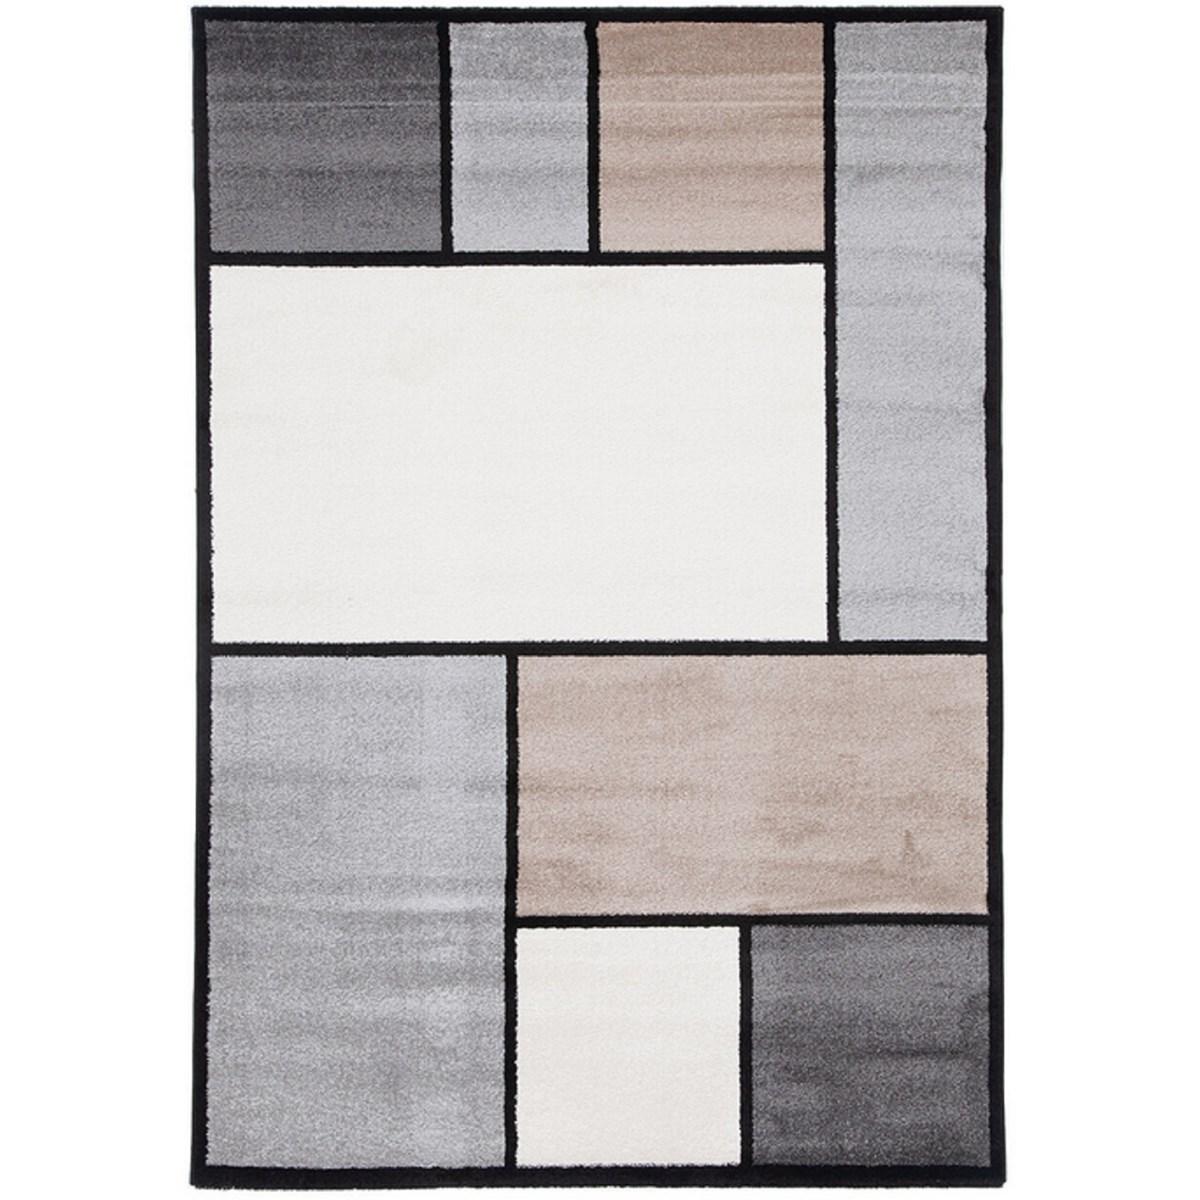 Tapis de salon en Polypropylène Beige 200x300 cm